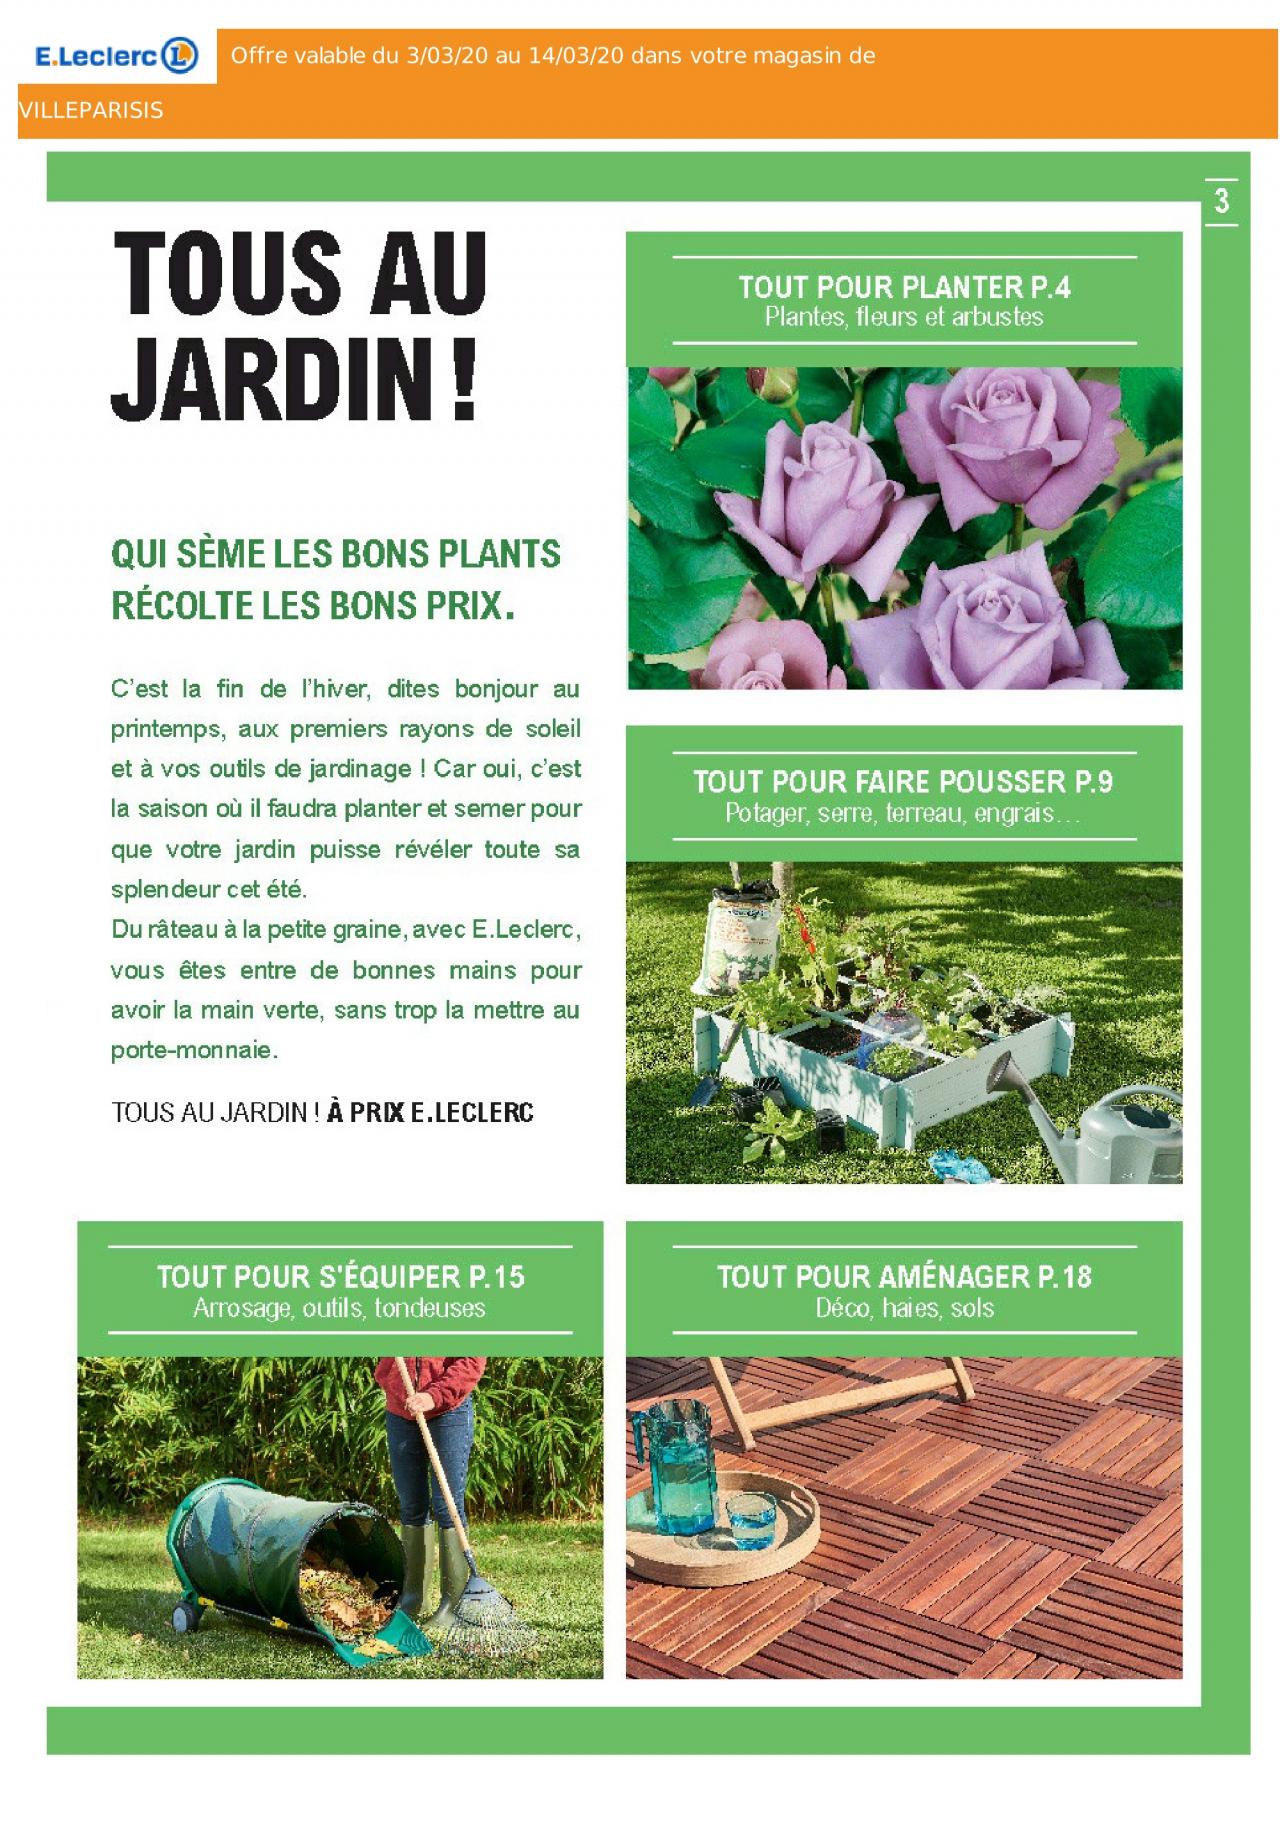 E.leclerc Solde Du 03/03/2020 | Kupino.fr serapportantà Tondeuse Leclerc Jardin